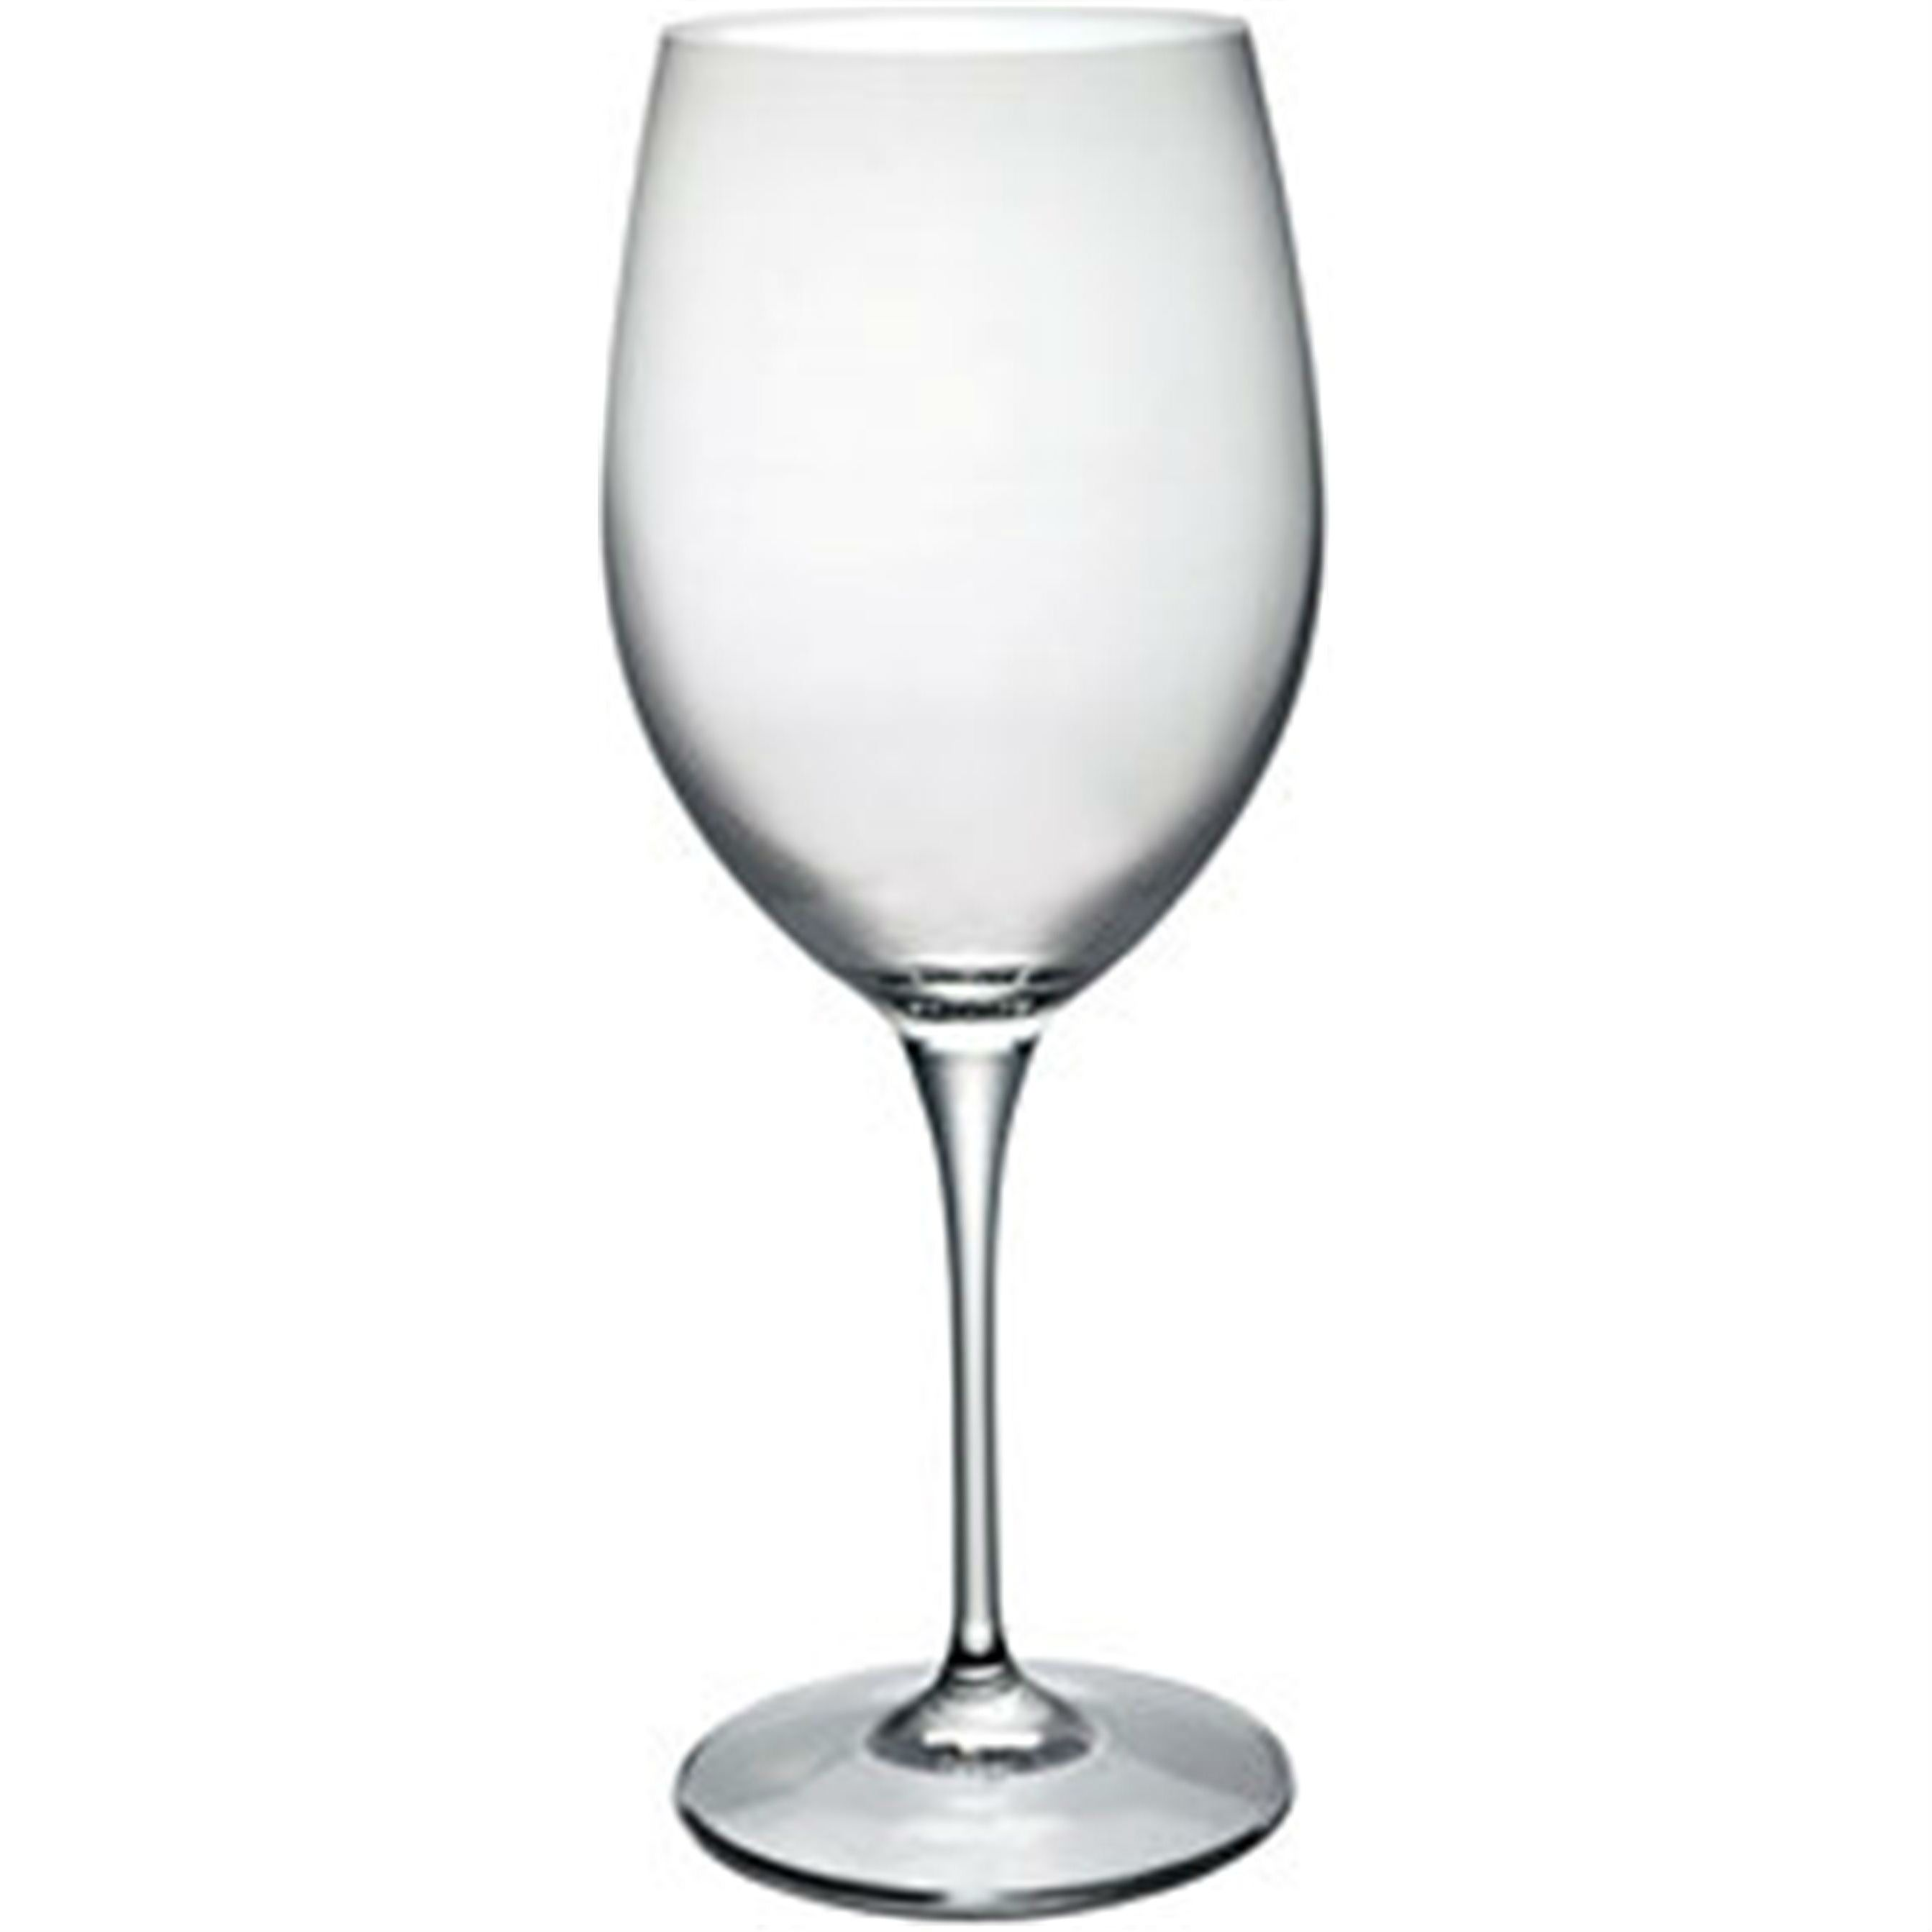 bormioli_wijnglazen_premium_60cl.jpg